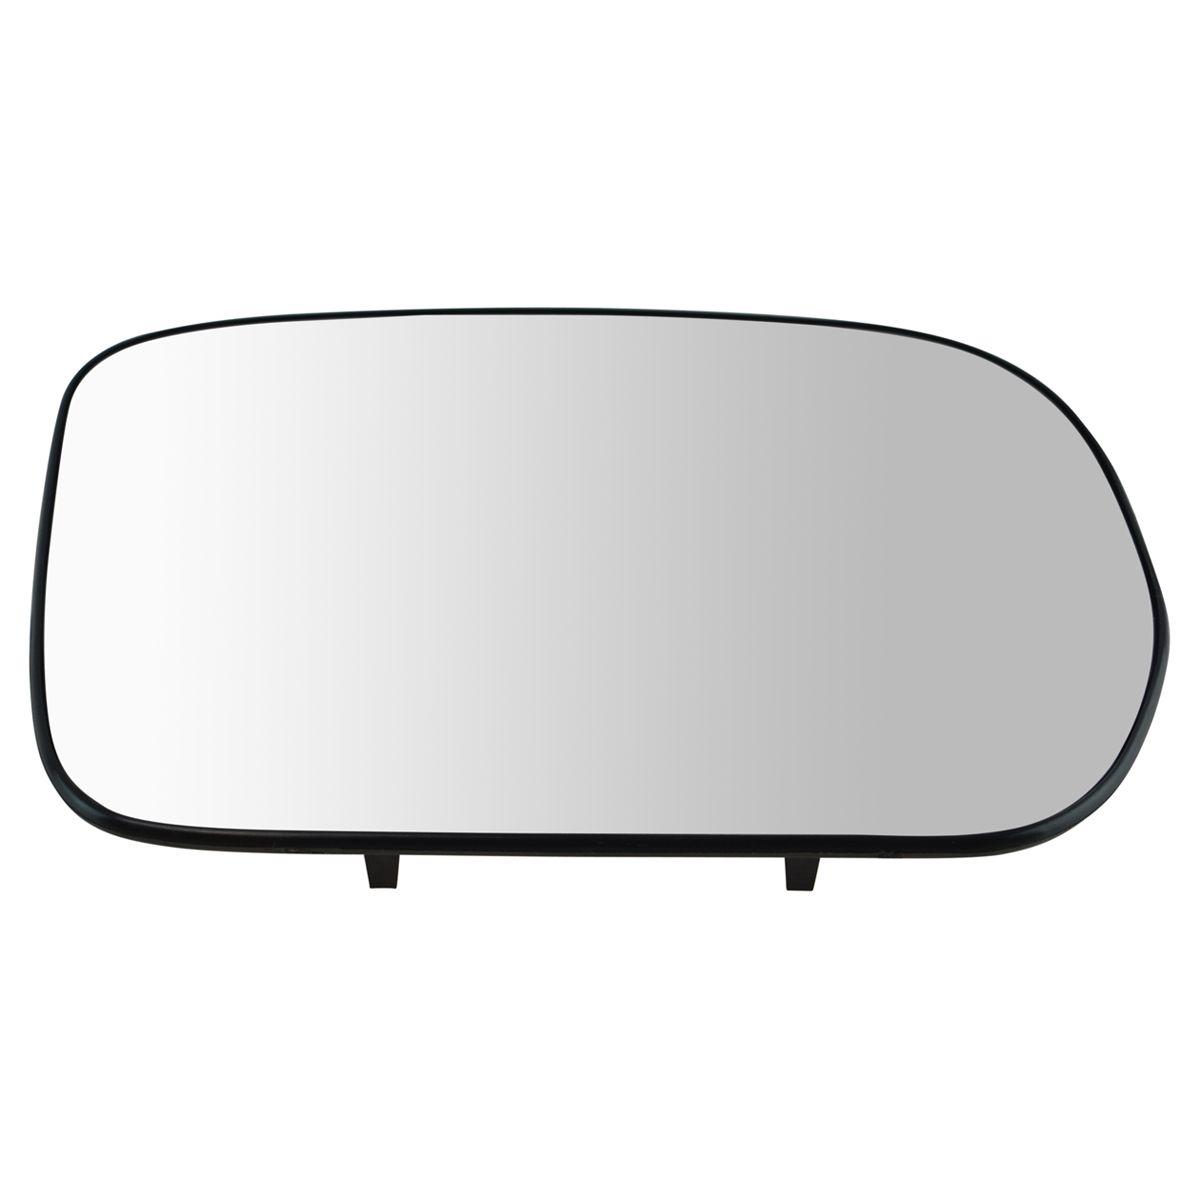 NEW Mirror Glass AND BACKING HEATED 03-07 HONDA ACCORD SEDAN Driver Left Side